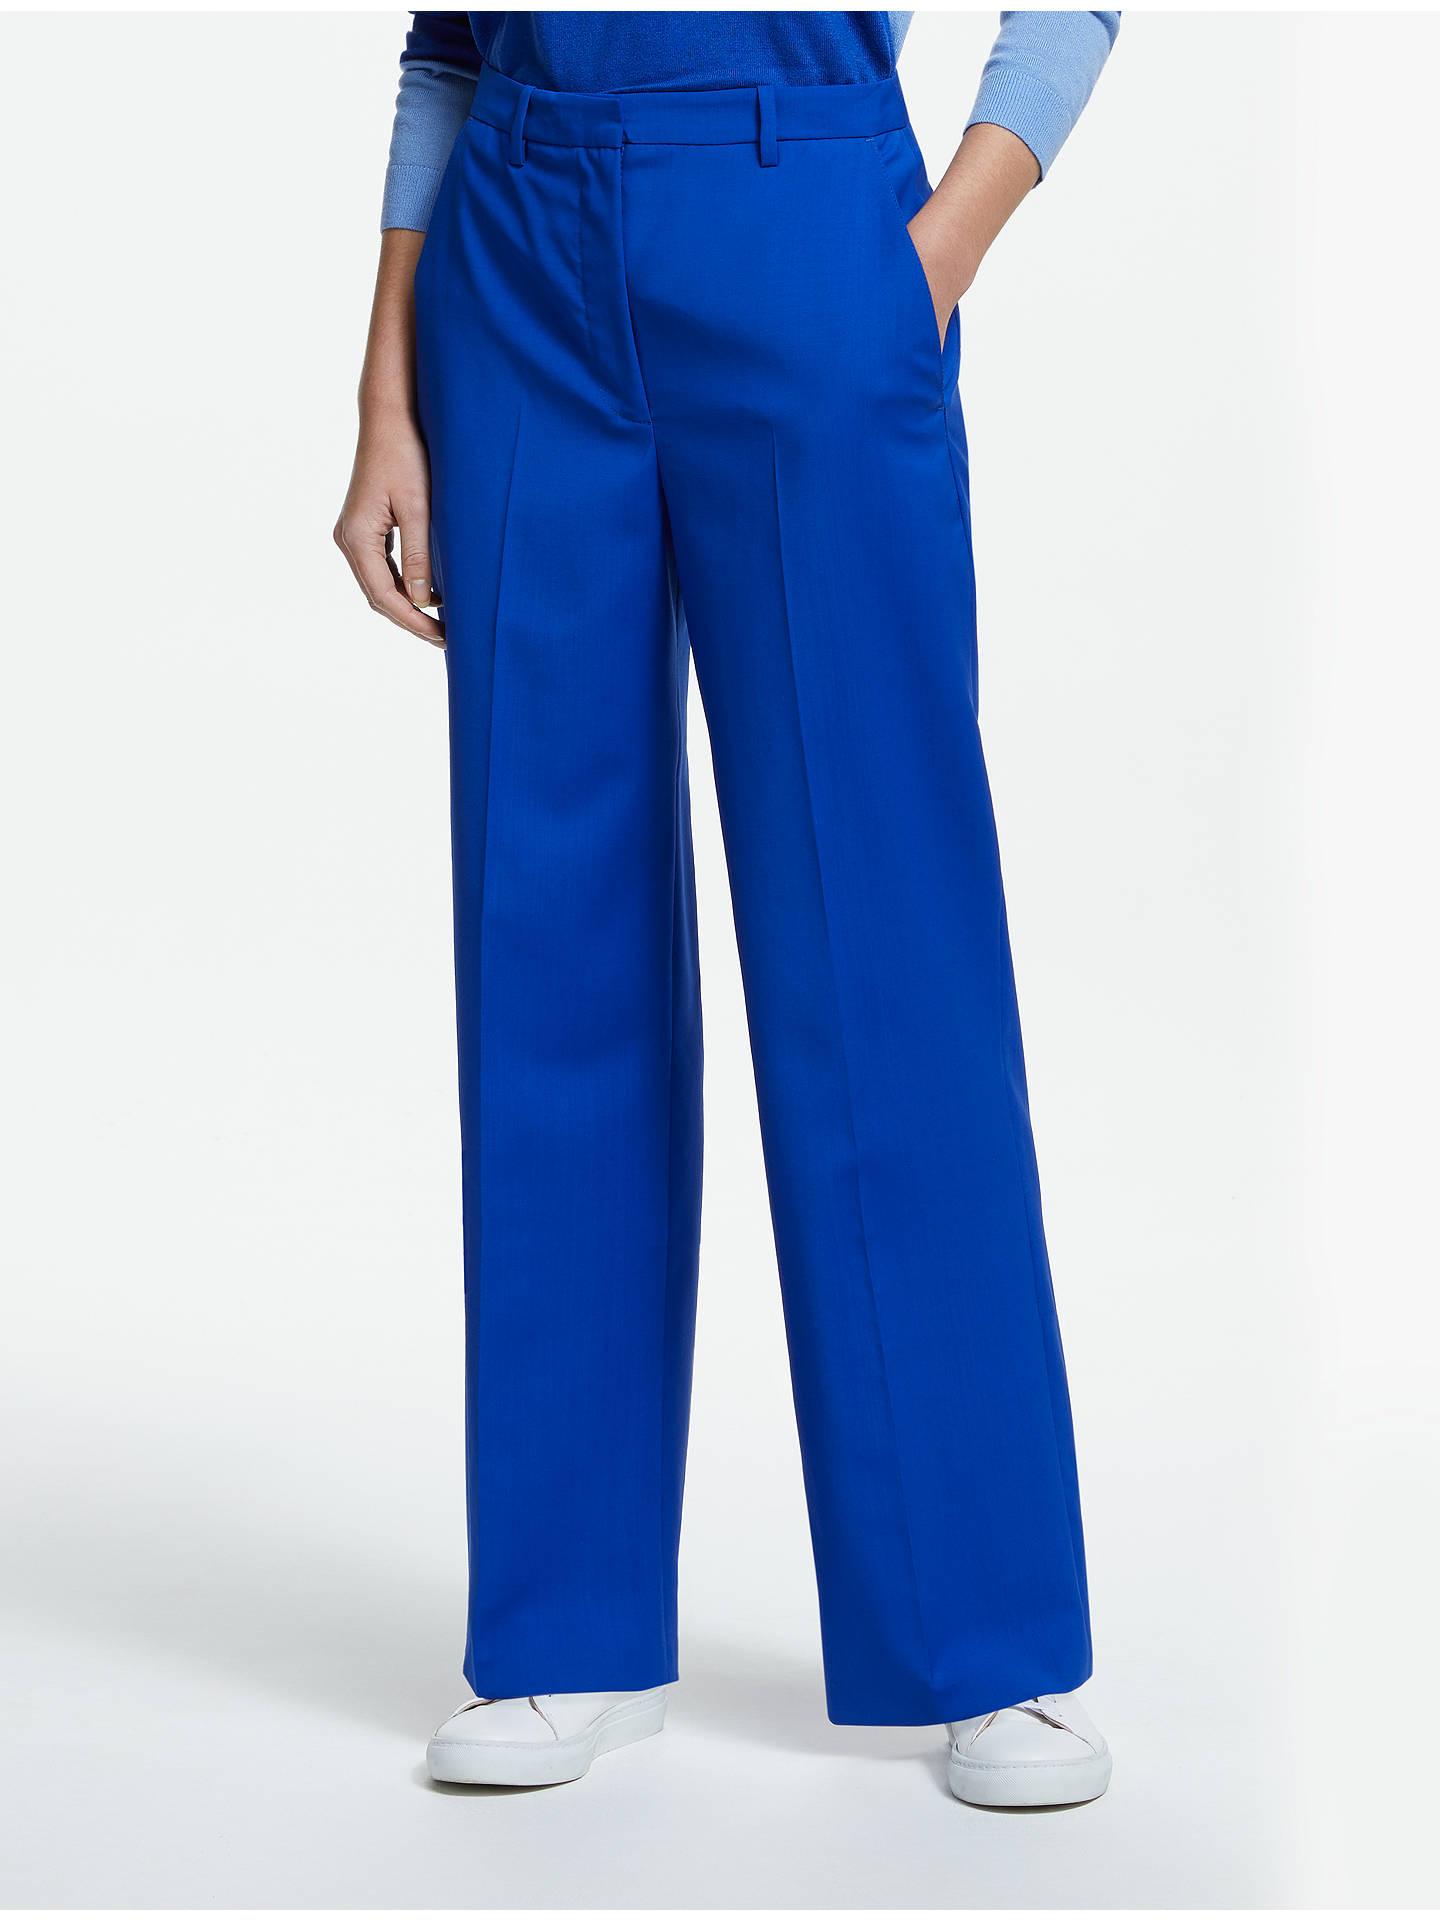 312a54caab John Lewis & Partners Wide Leg Trousers, Cobalt